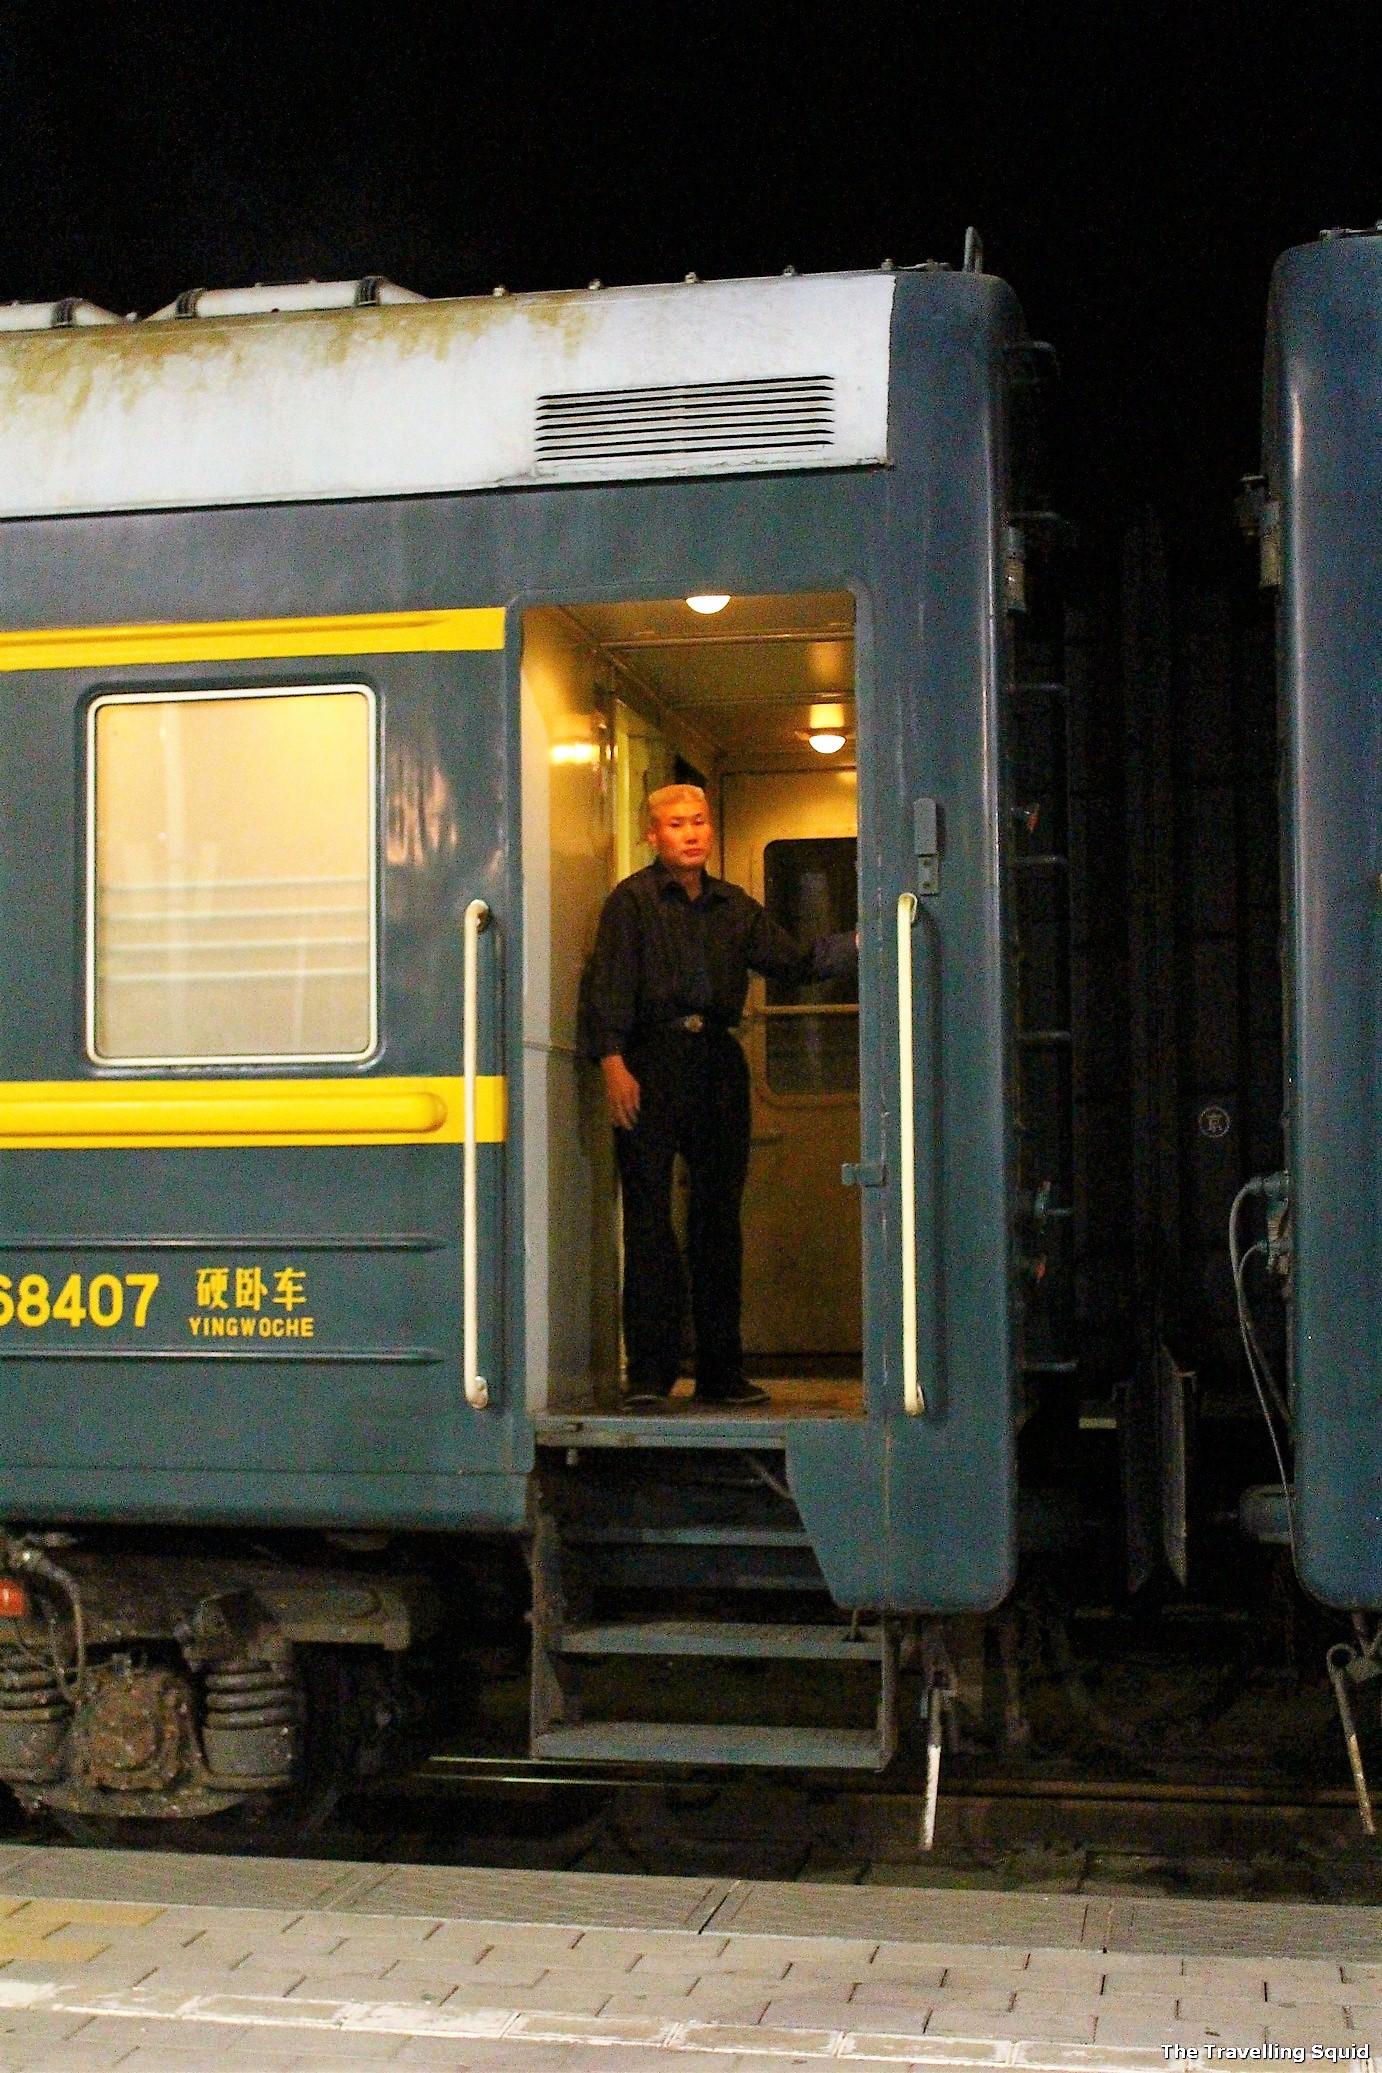 Trans siberian attendant train